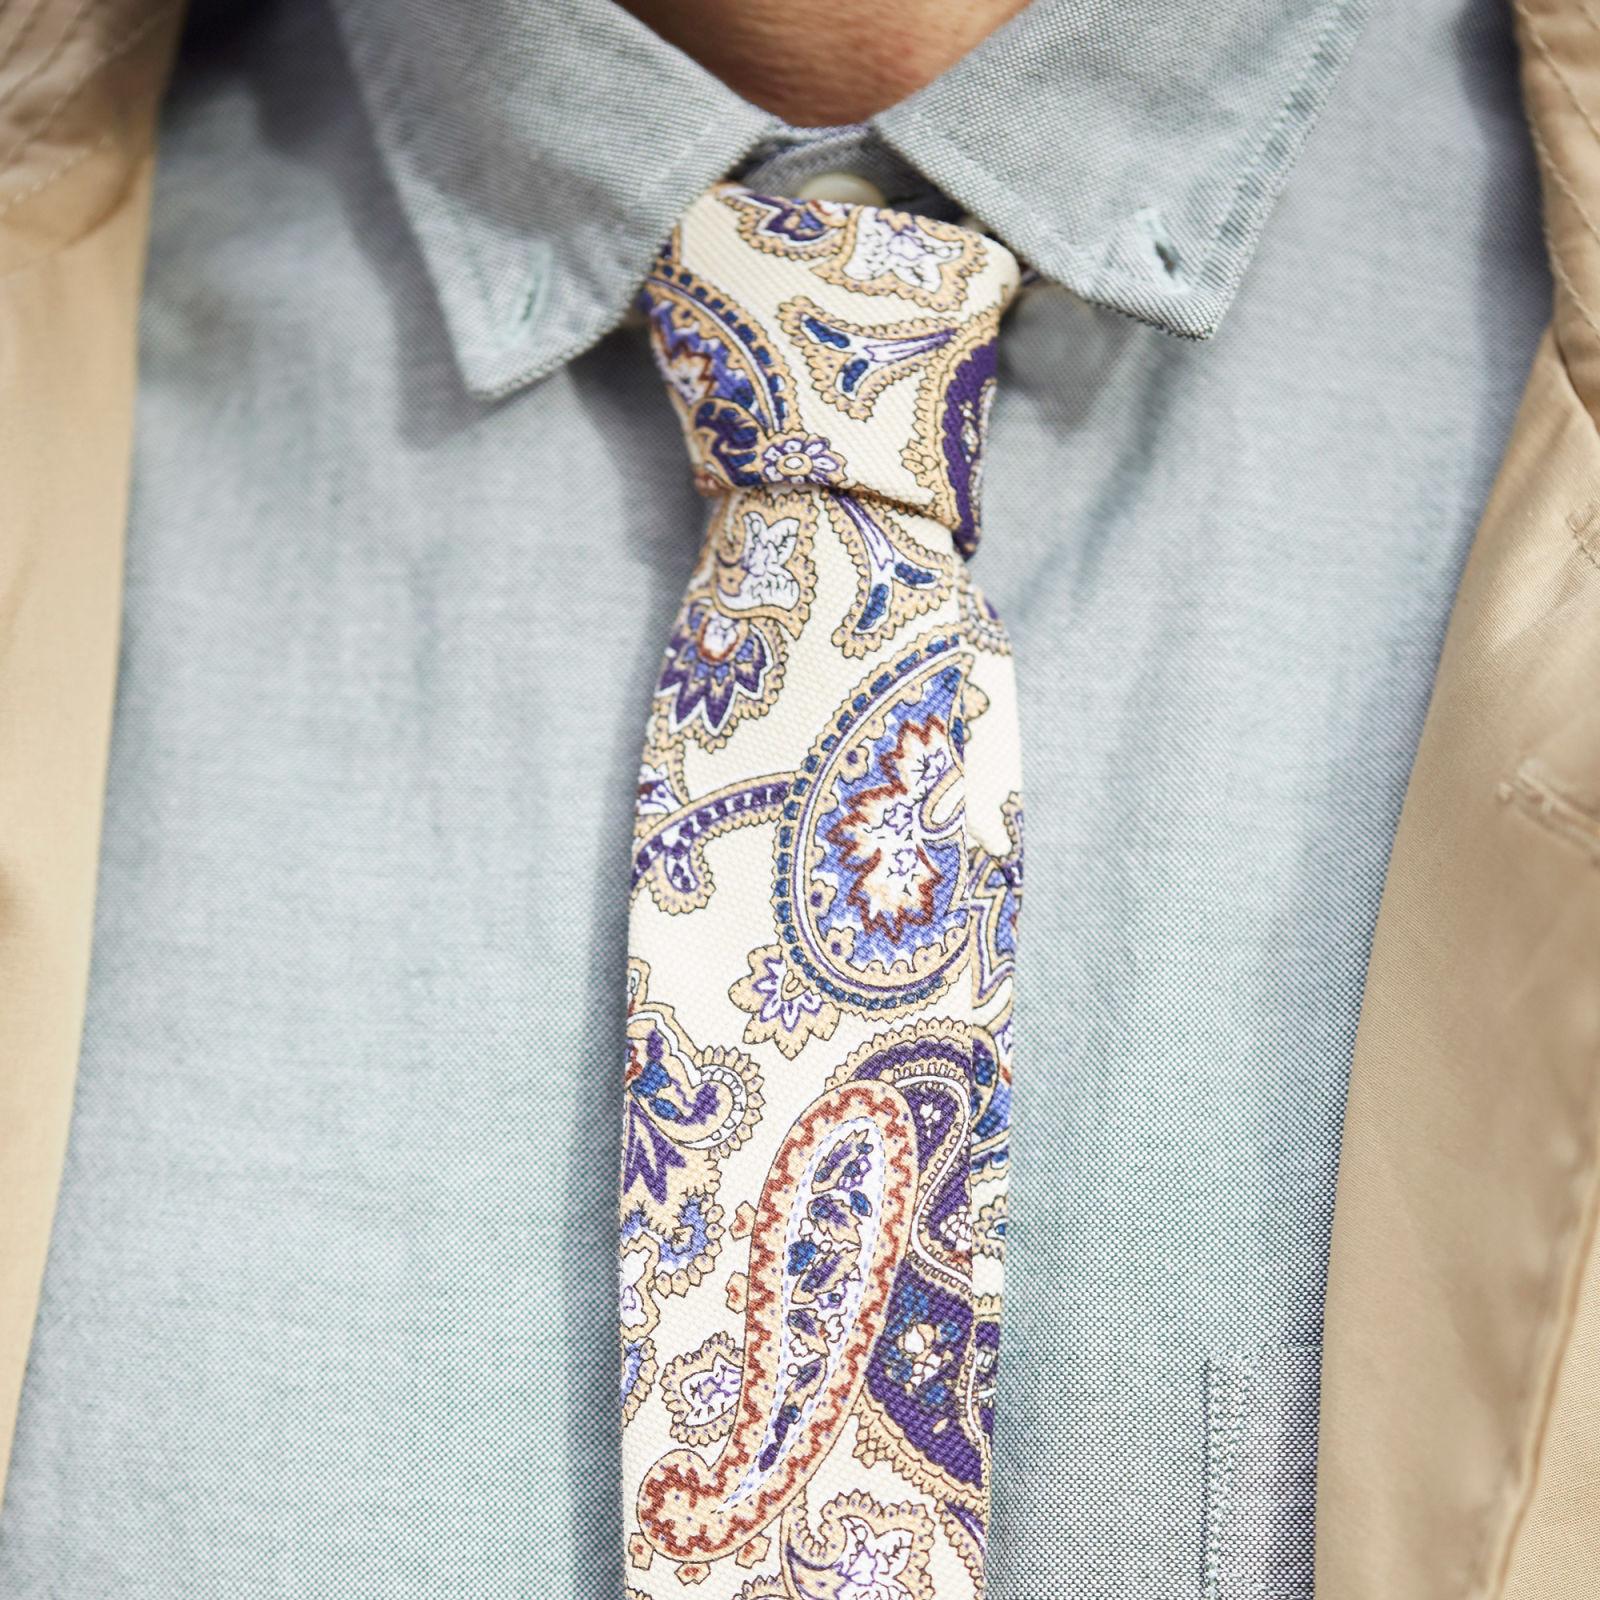 Corbata crema con diseño de cachemira  6579a9cf77b